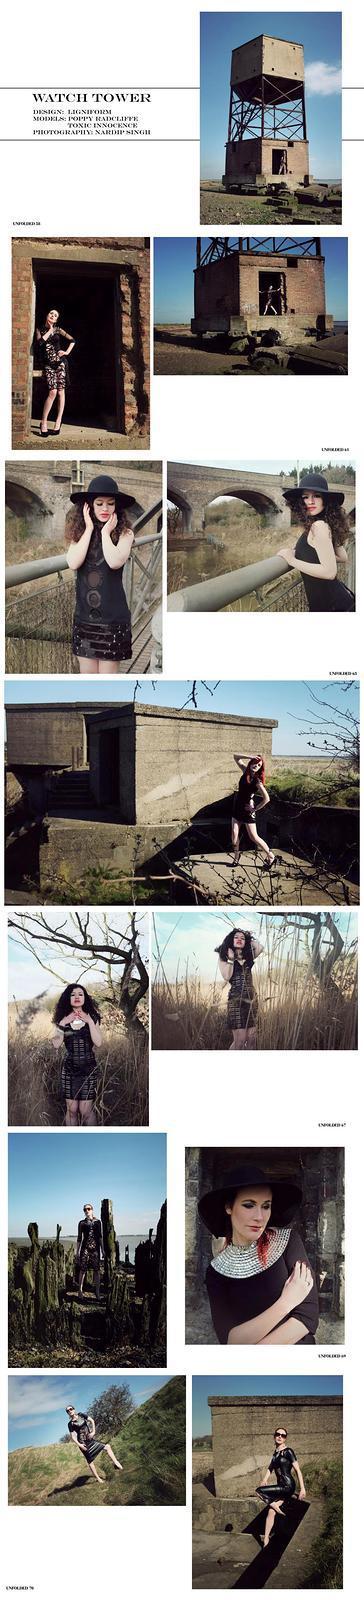 Photography by Nardip, Model Poppy Radcliffe, Designer Ligniform / Uploaded 1st April 2015 @ 12:32 AM